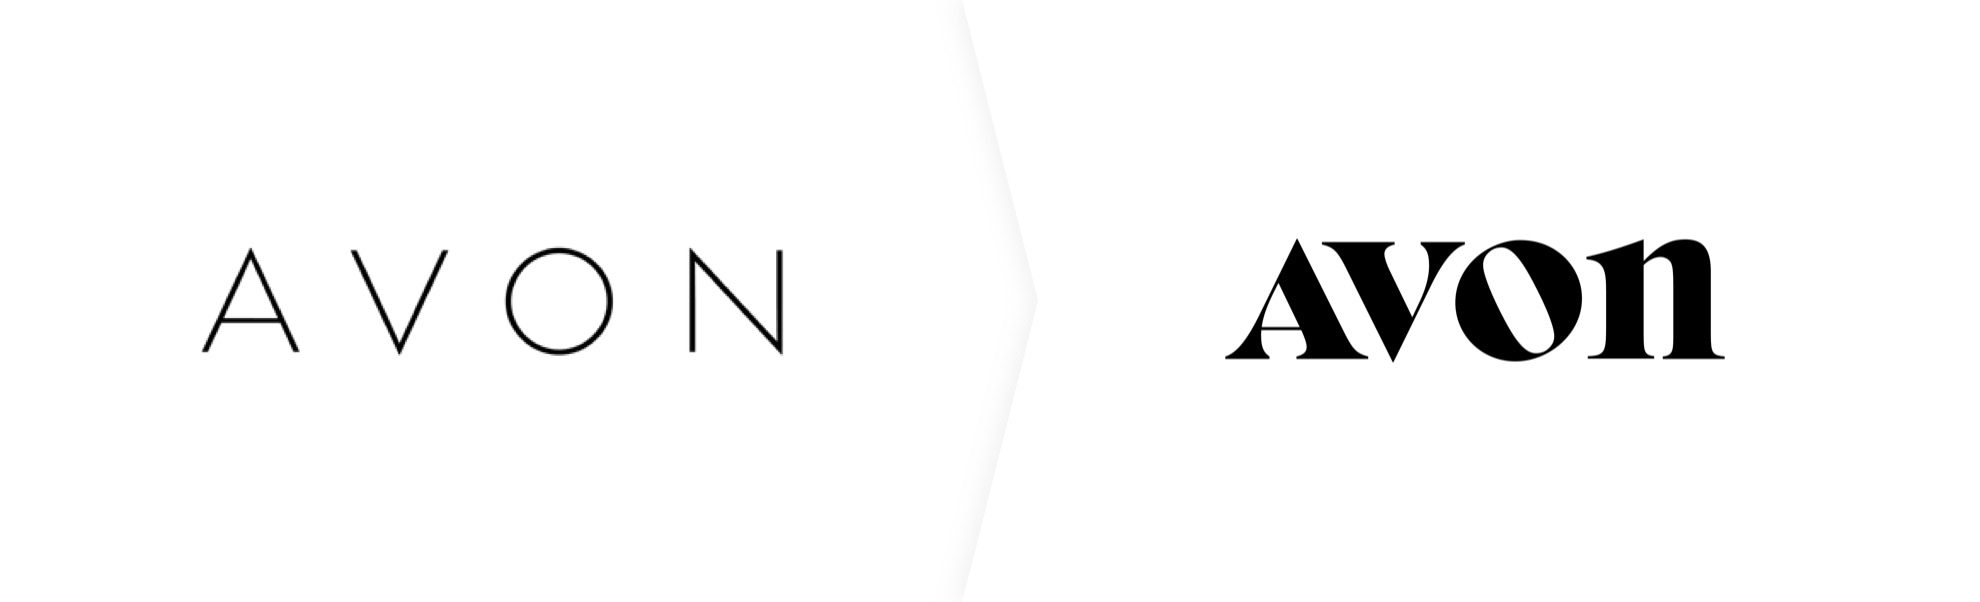 stare i nowe logo Avon